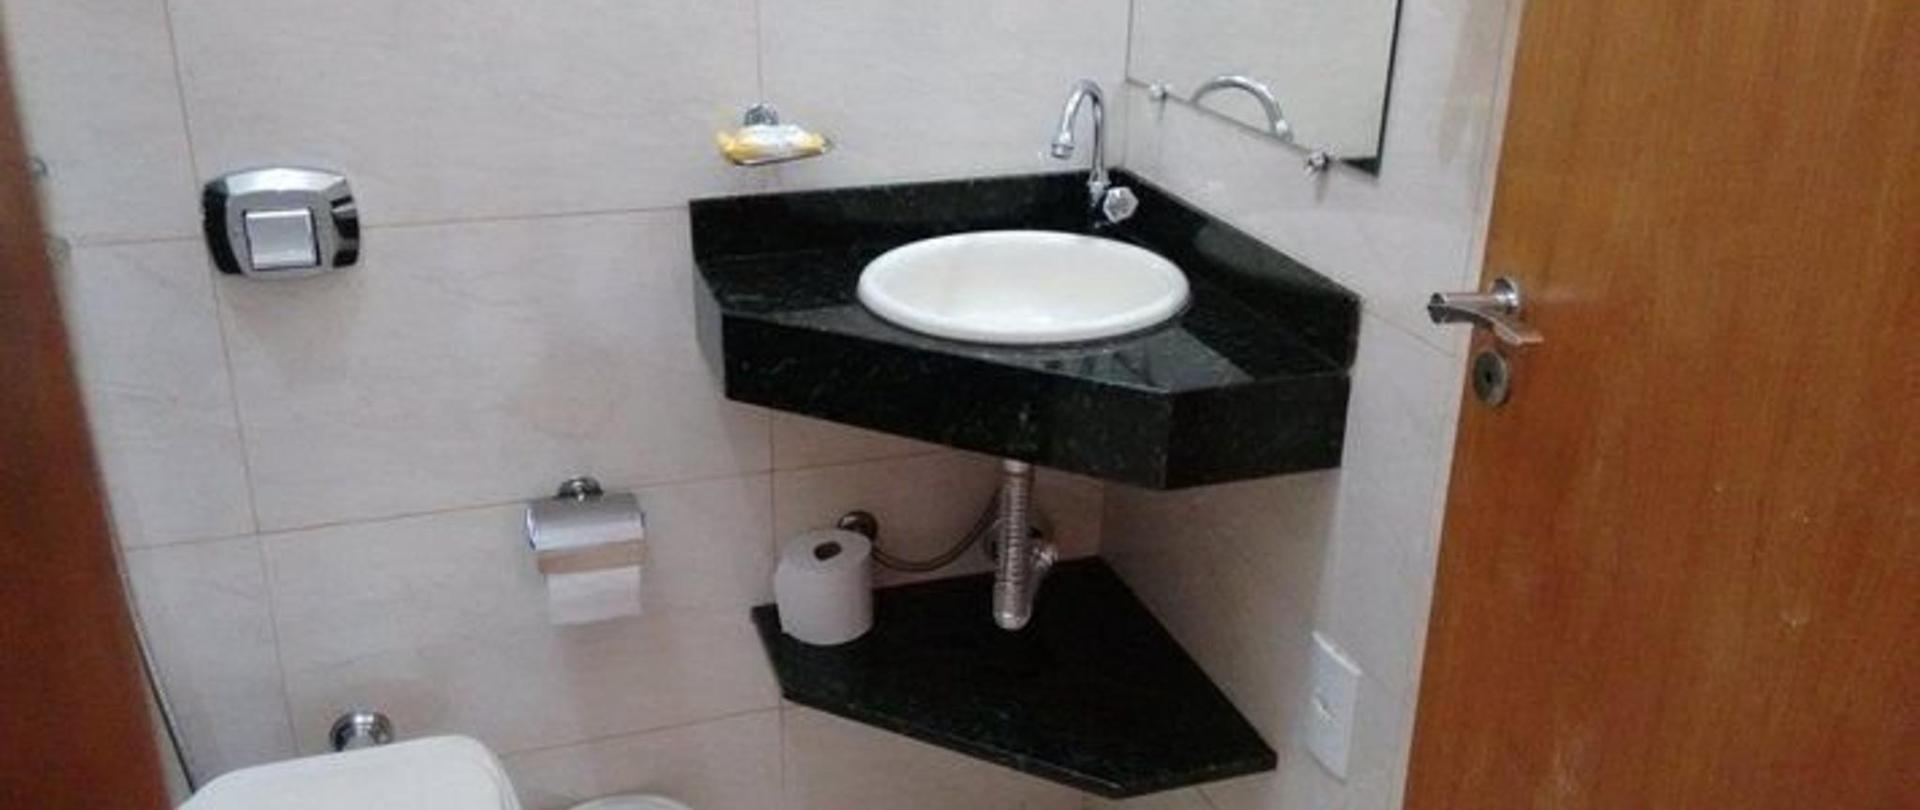 03-banheiro-4-1.jpg